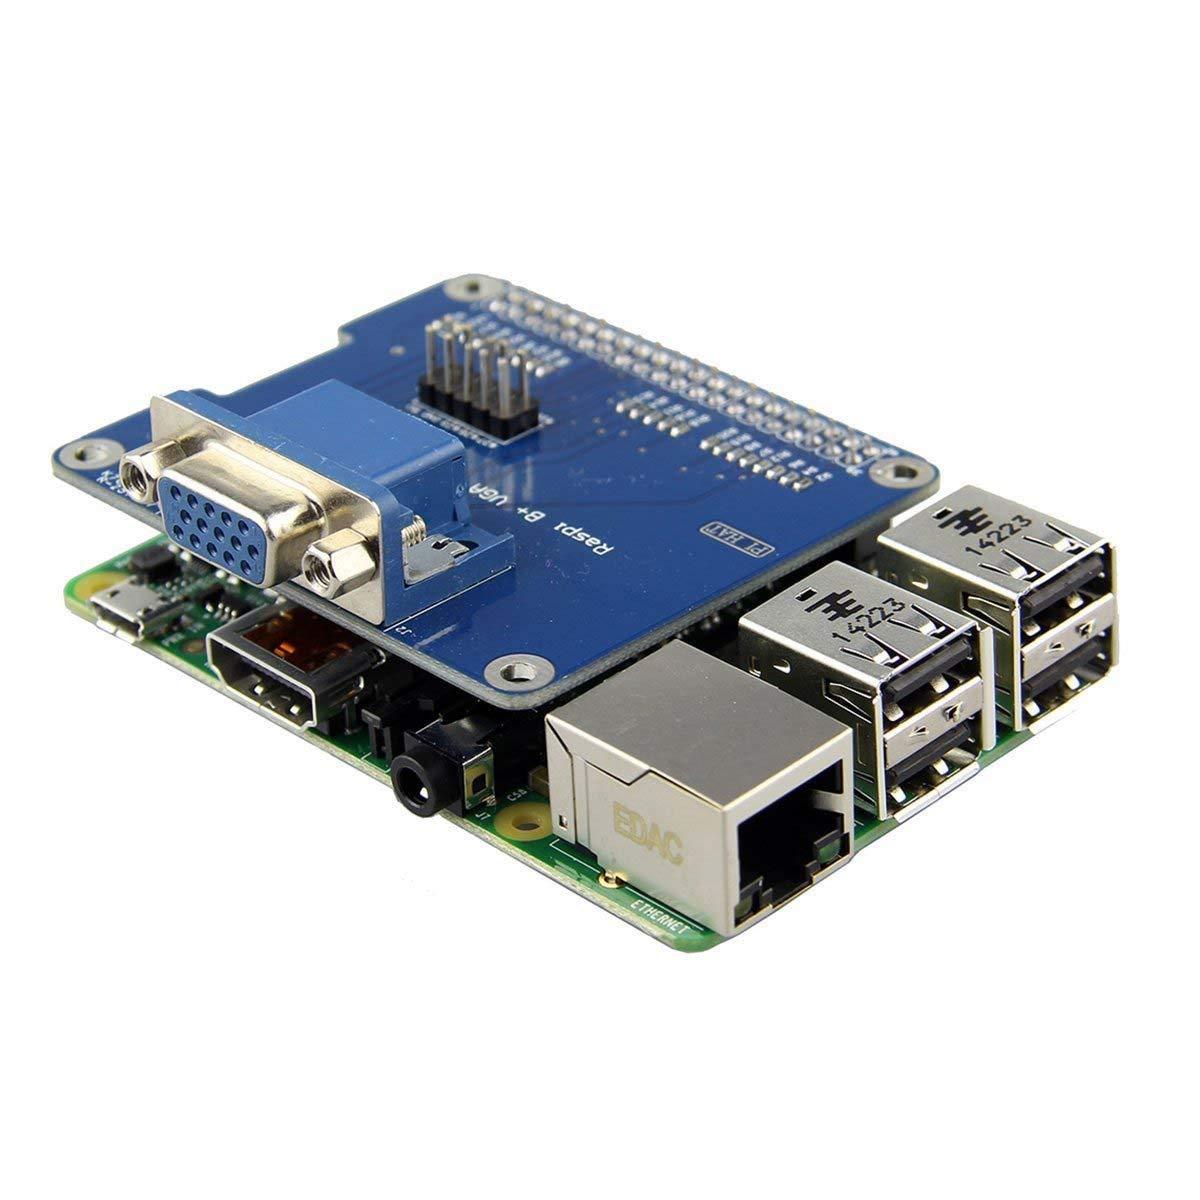 VGA Shield V2.0 Expansion Board - TOOGOO(R)VGA Shield V2.0 Expansion Board For Raspberry Pi 3B / 2B / B+ / A+ / VGA Shield V2.0 Expansion Board For Raspberry Pi 3B / 2B / B+ / A+ . . Extend a VGA interface via GPIO and remain HDMI. . .